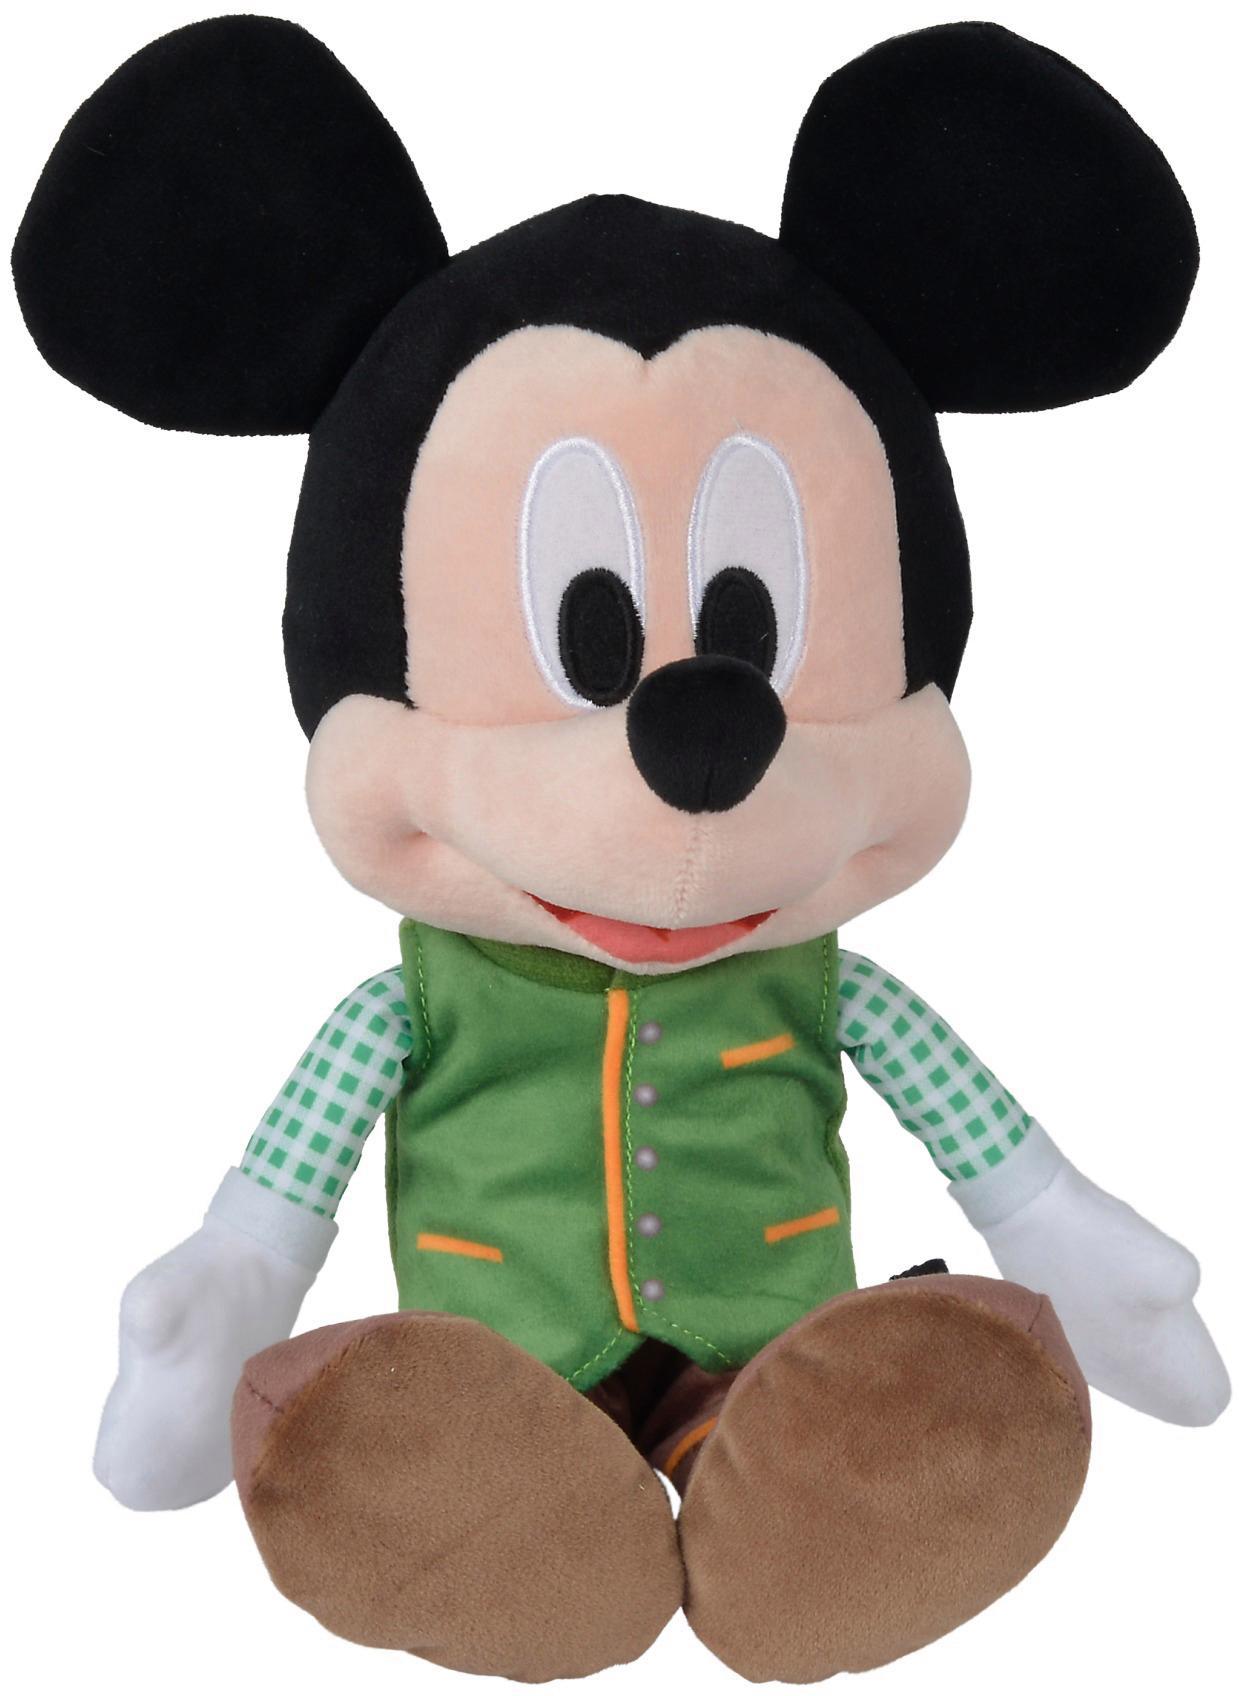 Simba Plüschfigur, »Disney Lederhosen Mickey, Refresh, 25 cm« | Bekleidung > Hosen > Lederhosen | Mehrfarbig | Ab | SIMBA